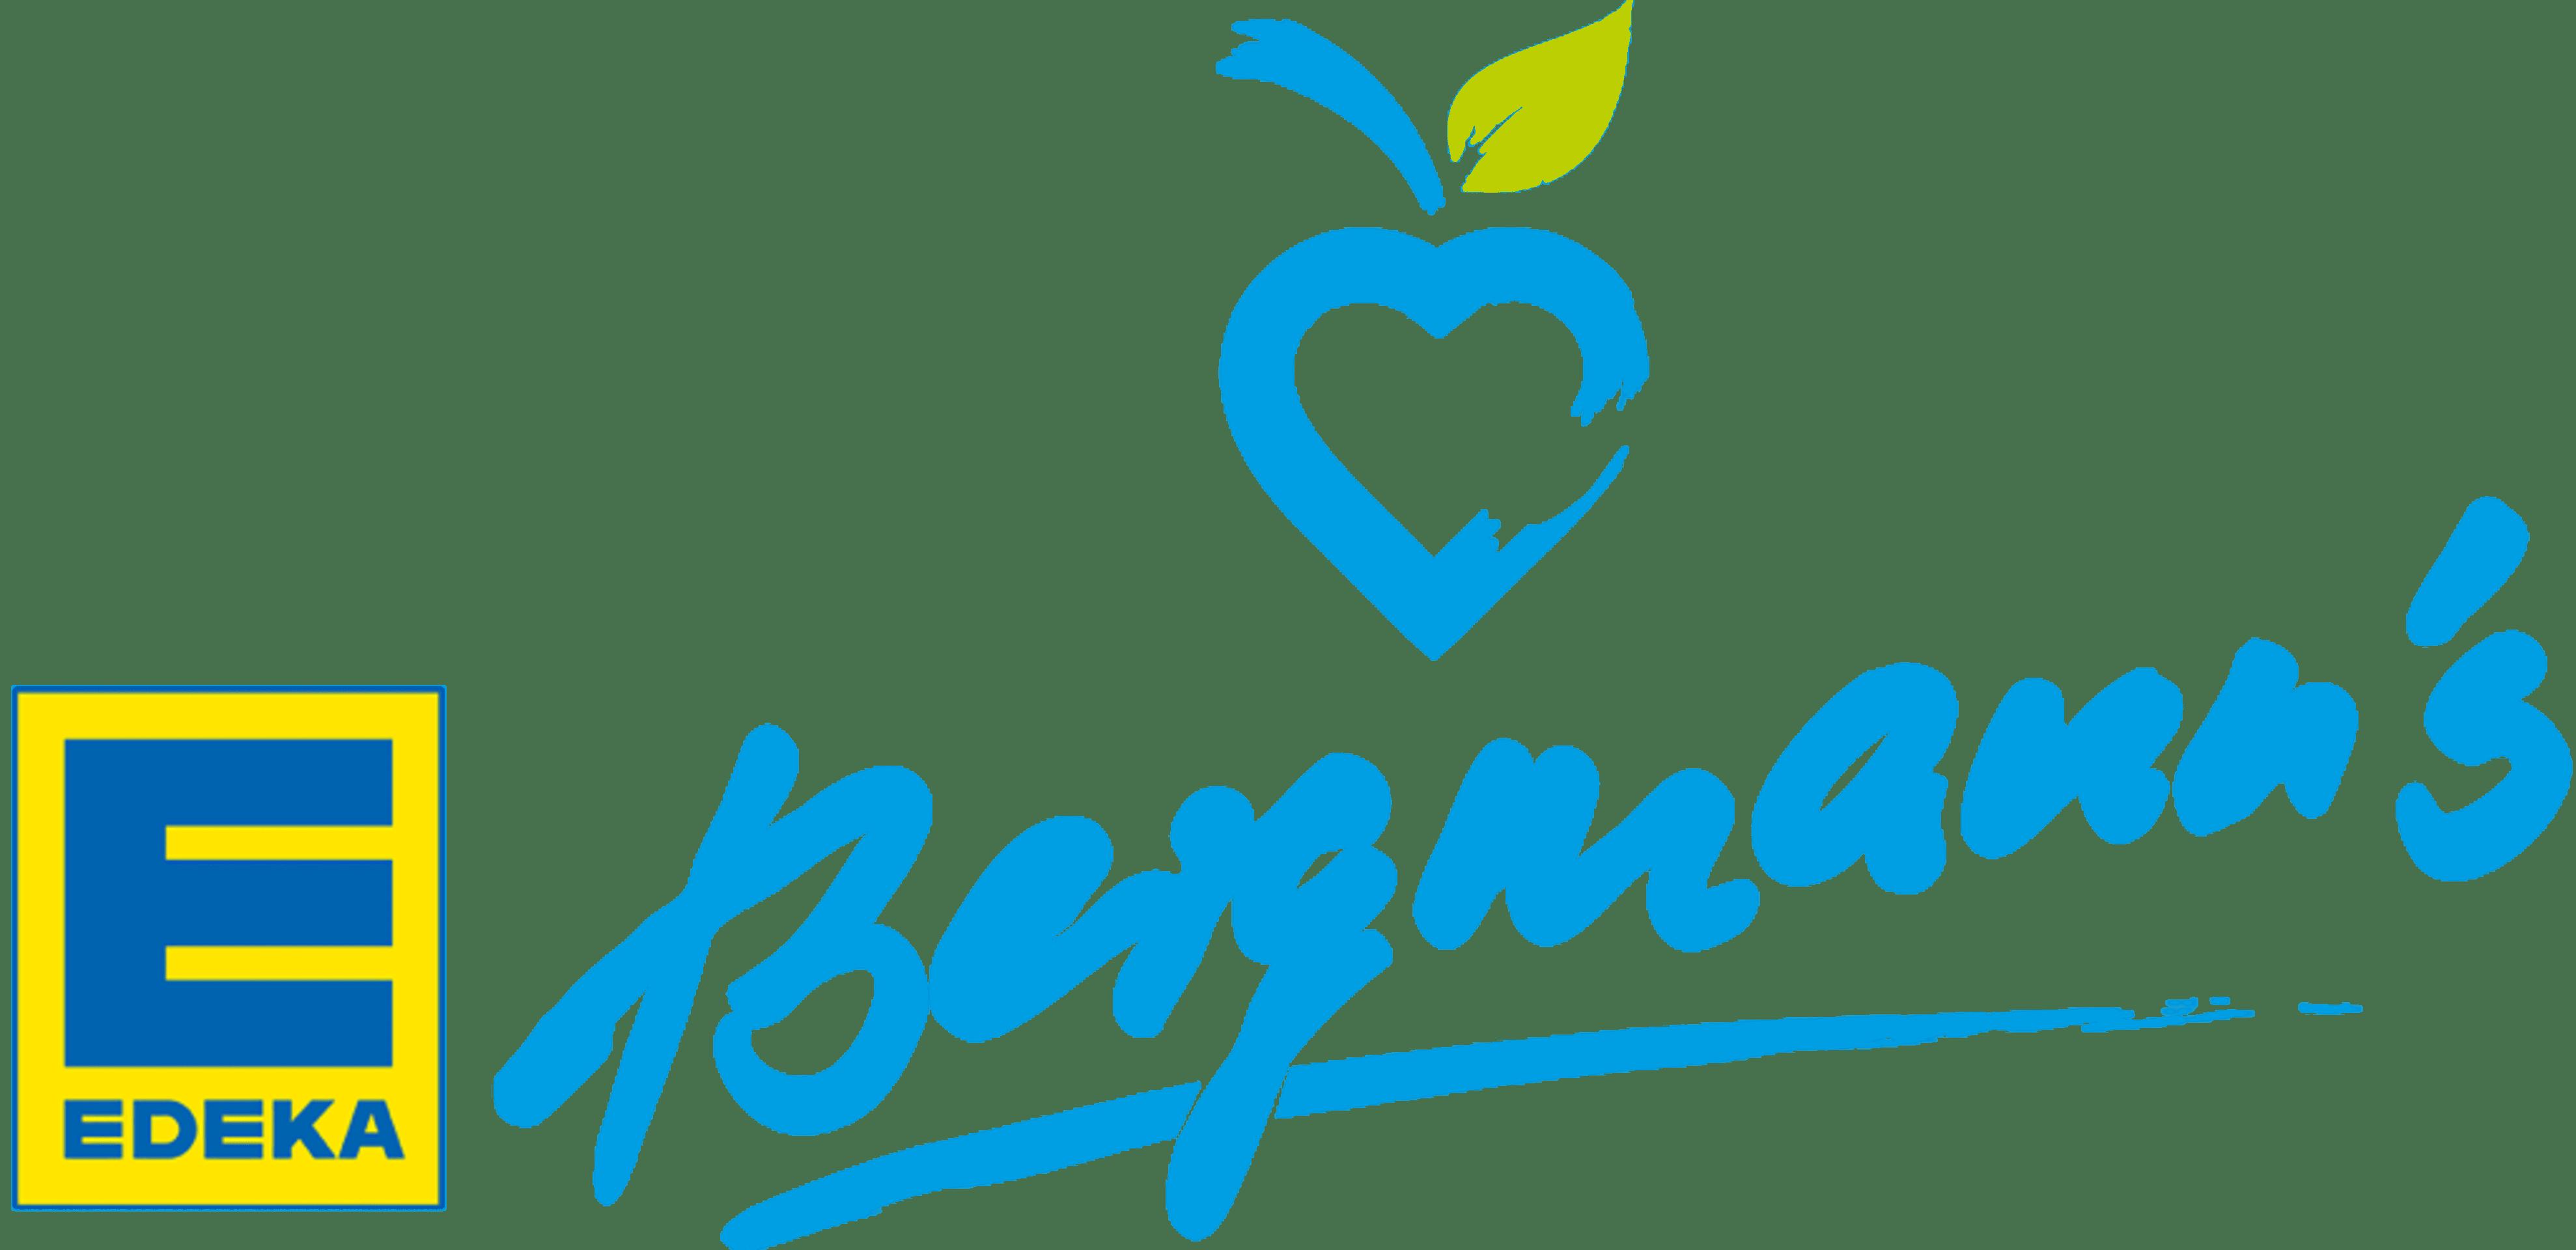 logo Edeka Bergmann